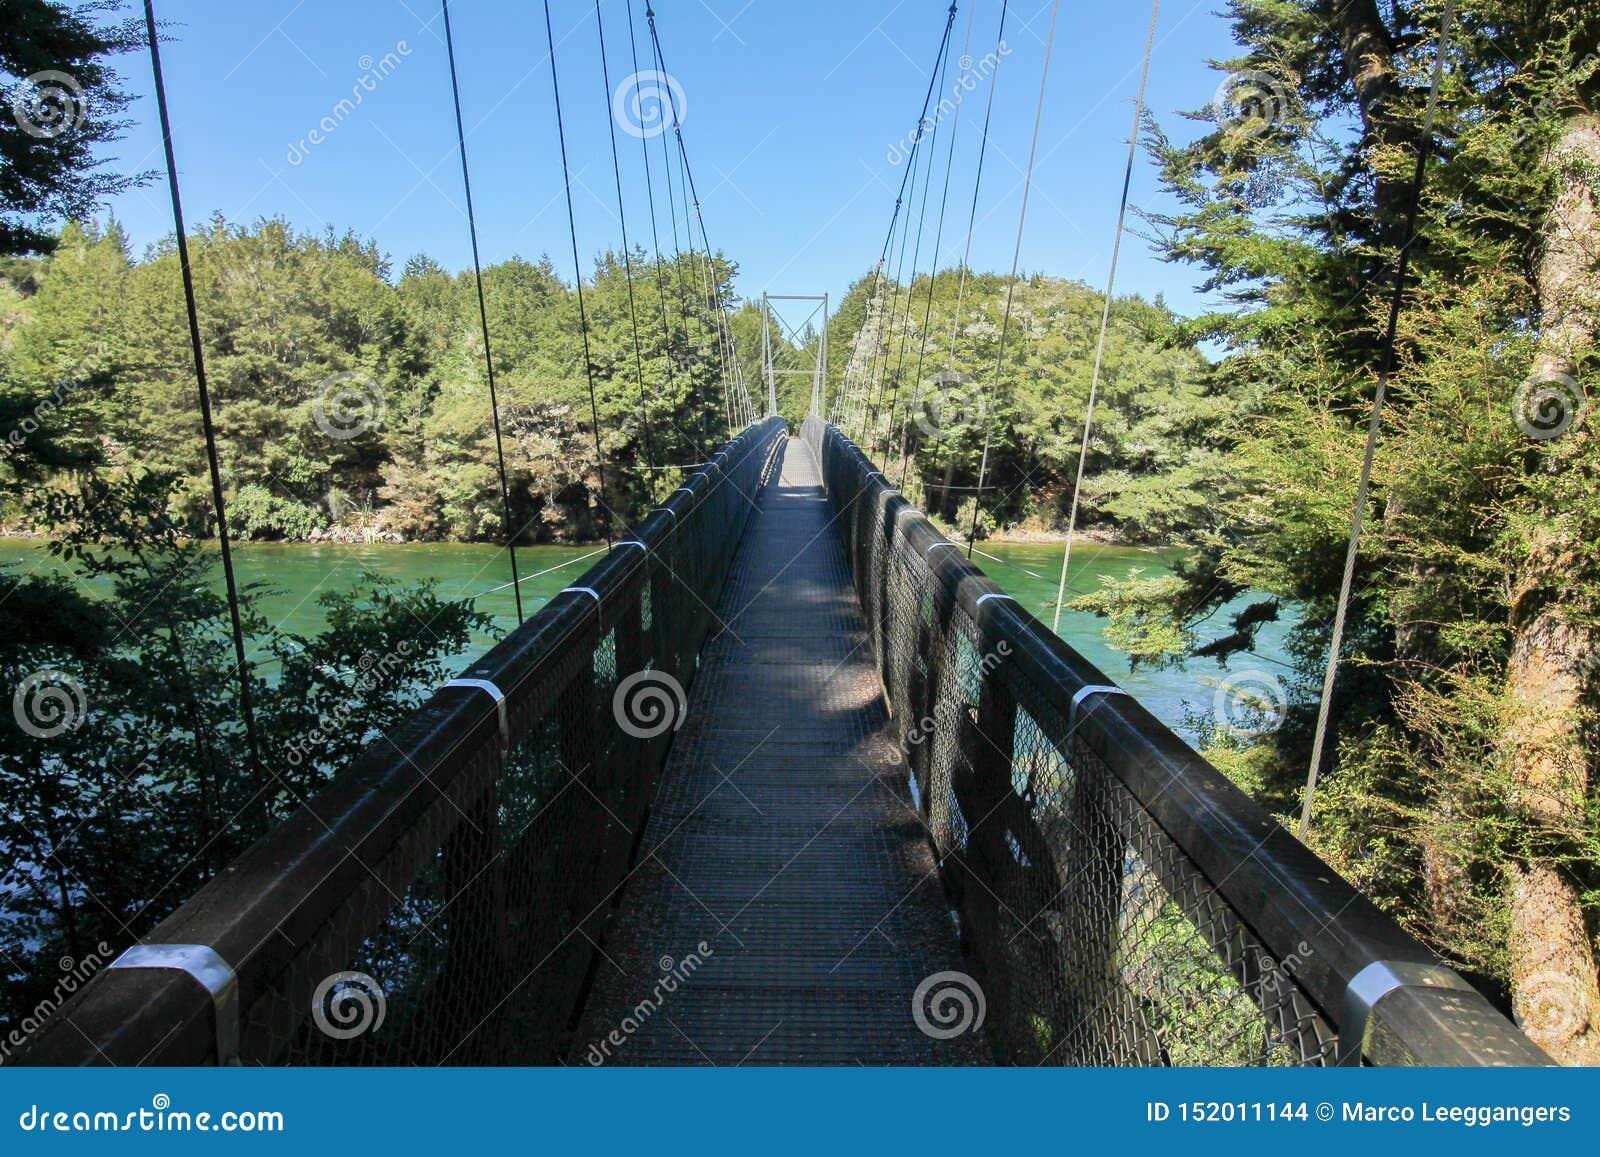 Rainbow Reach Kepler track Bridge over the Waiau River clean sky